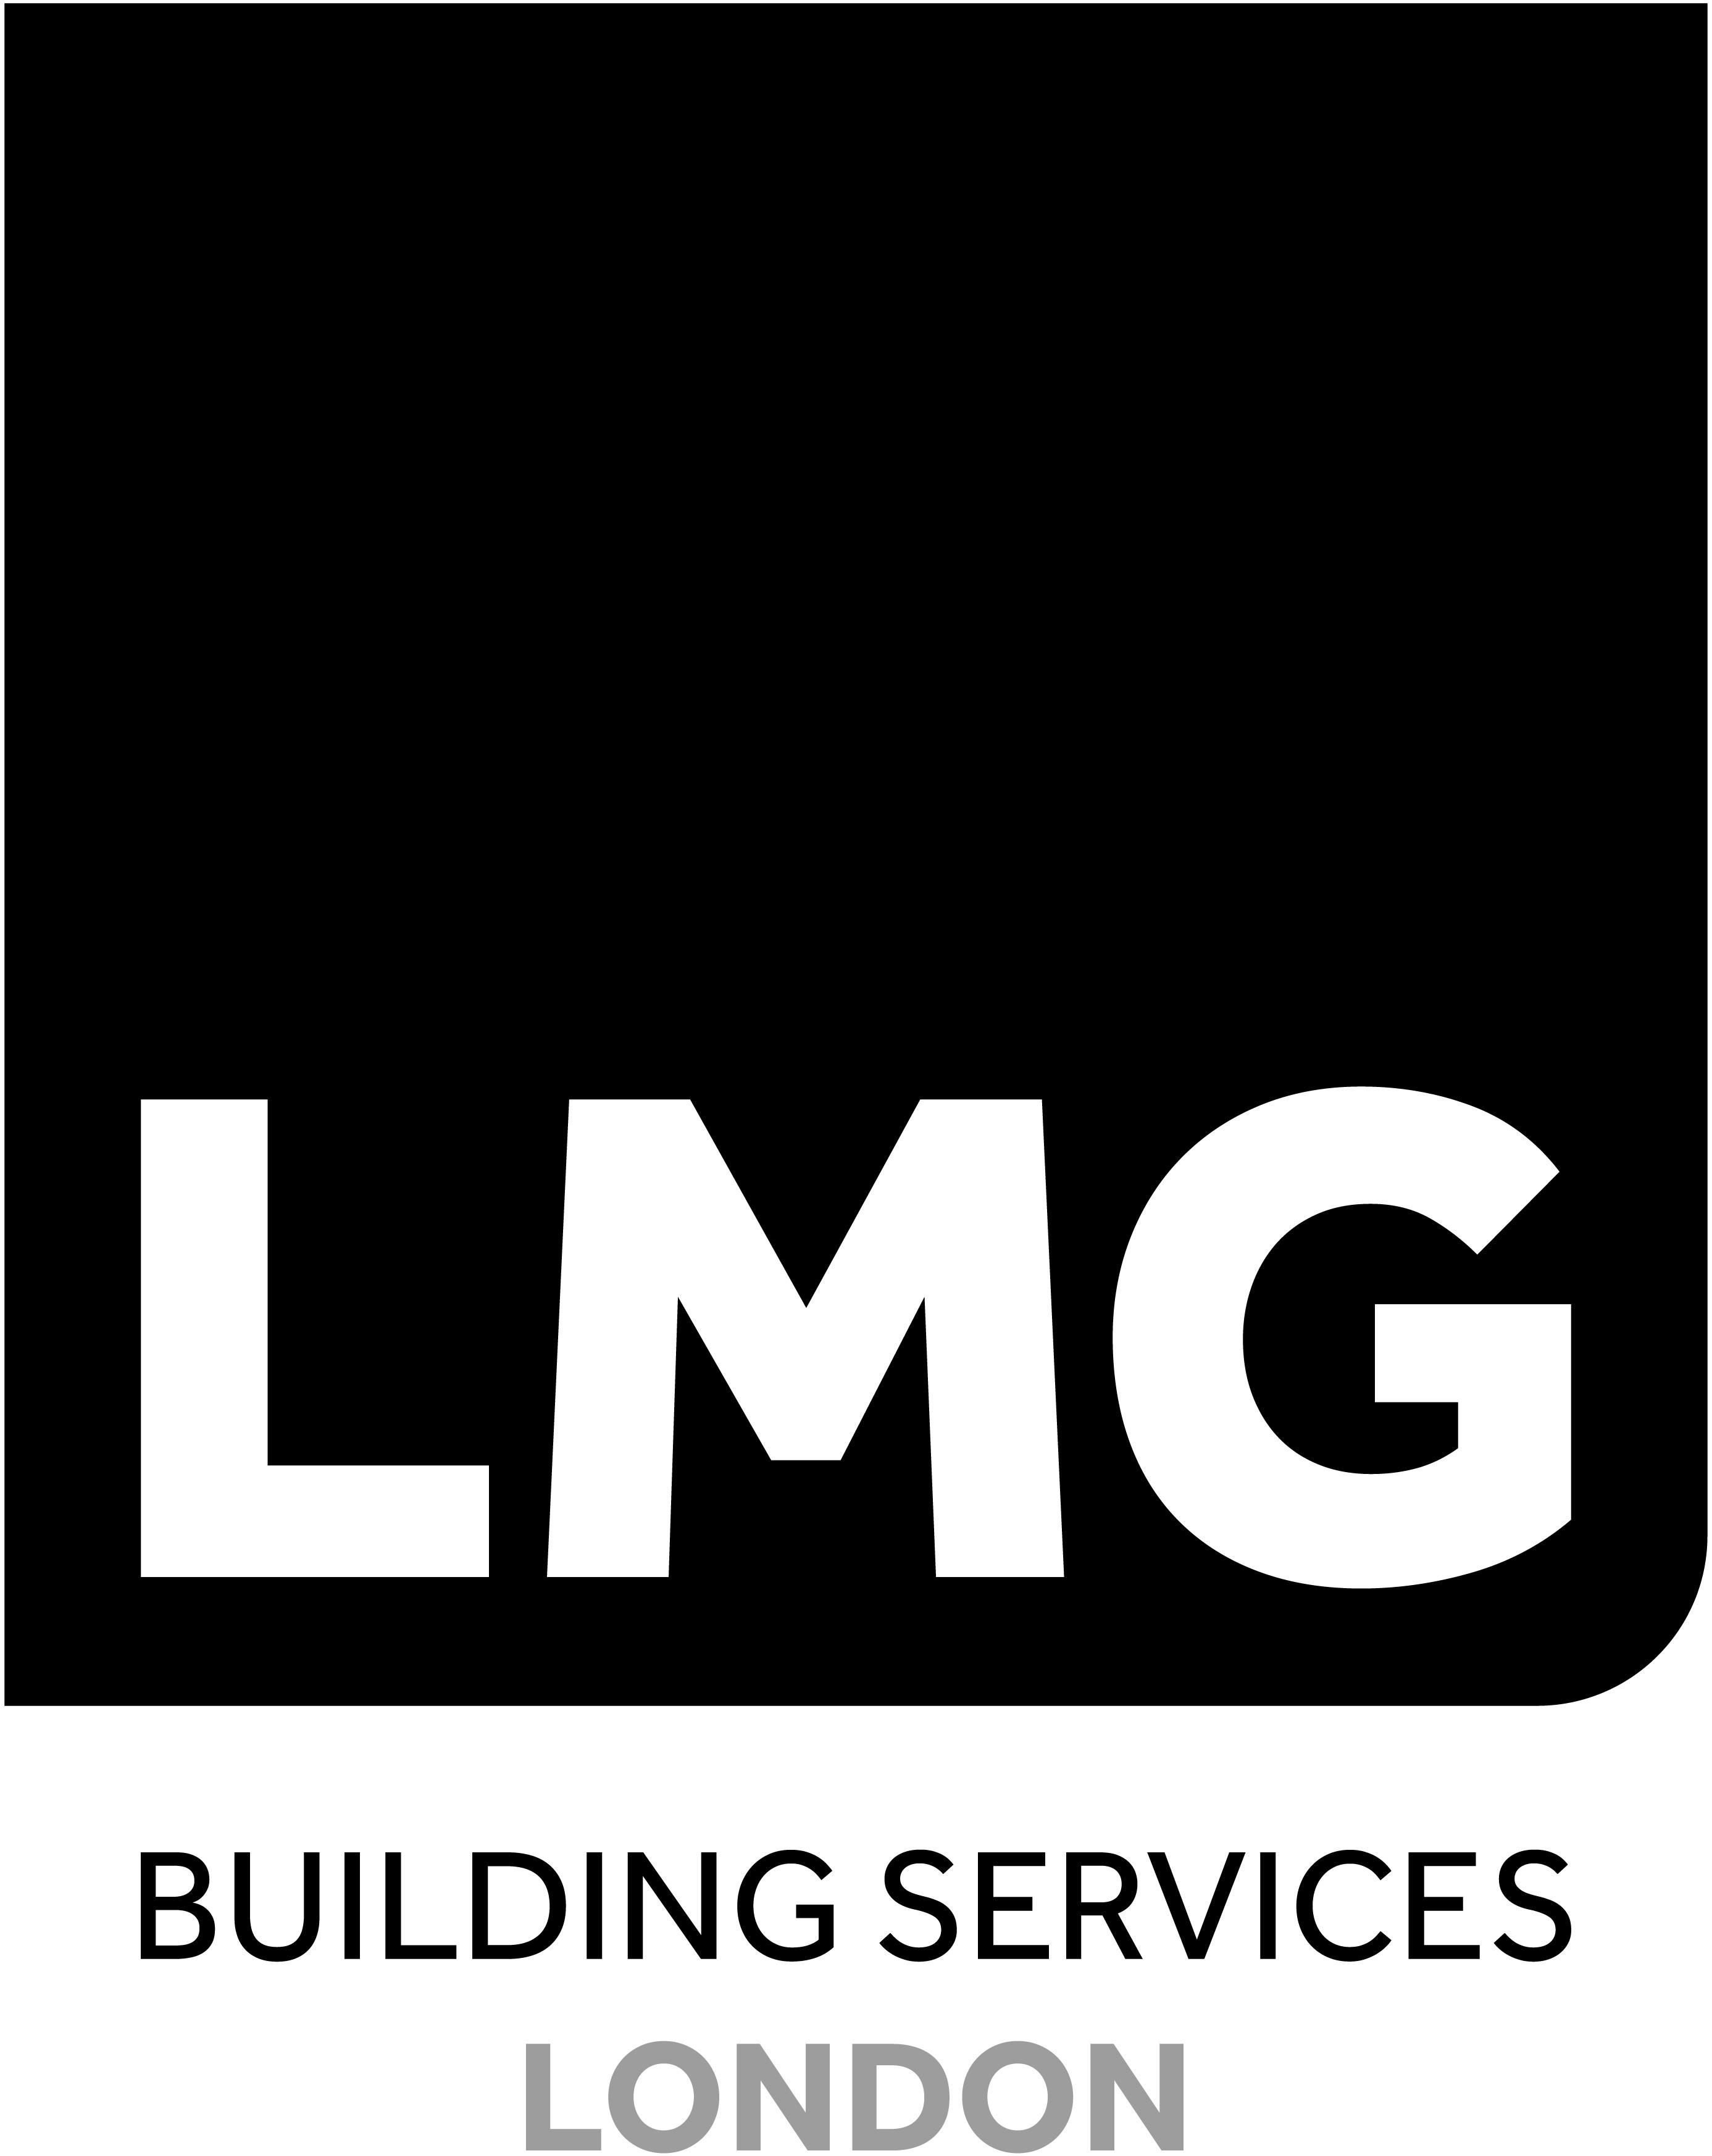 LMG Building Services Ltd